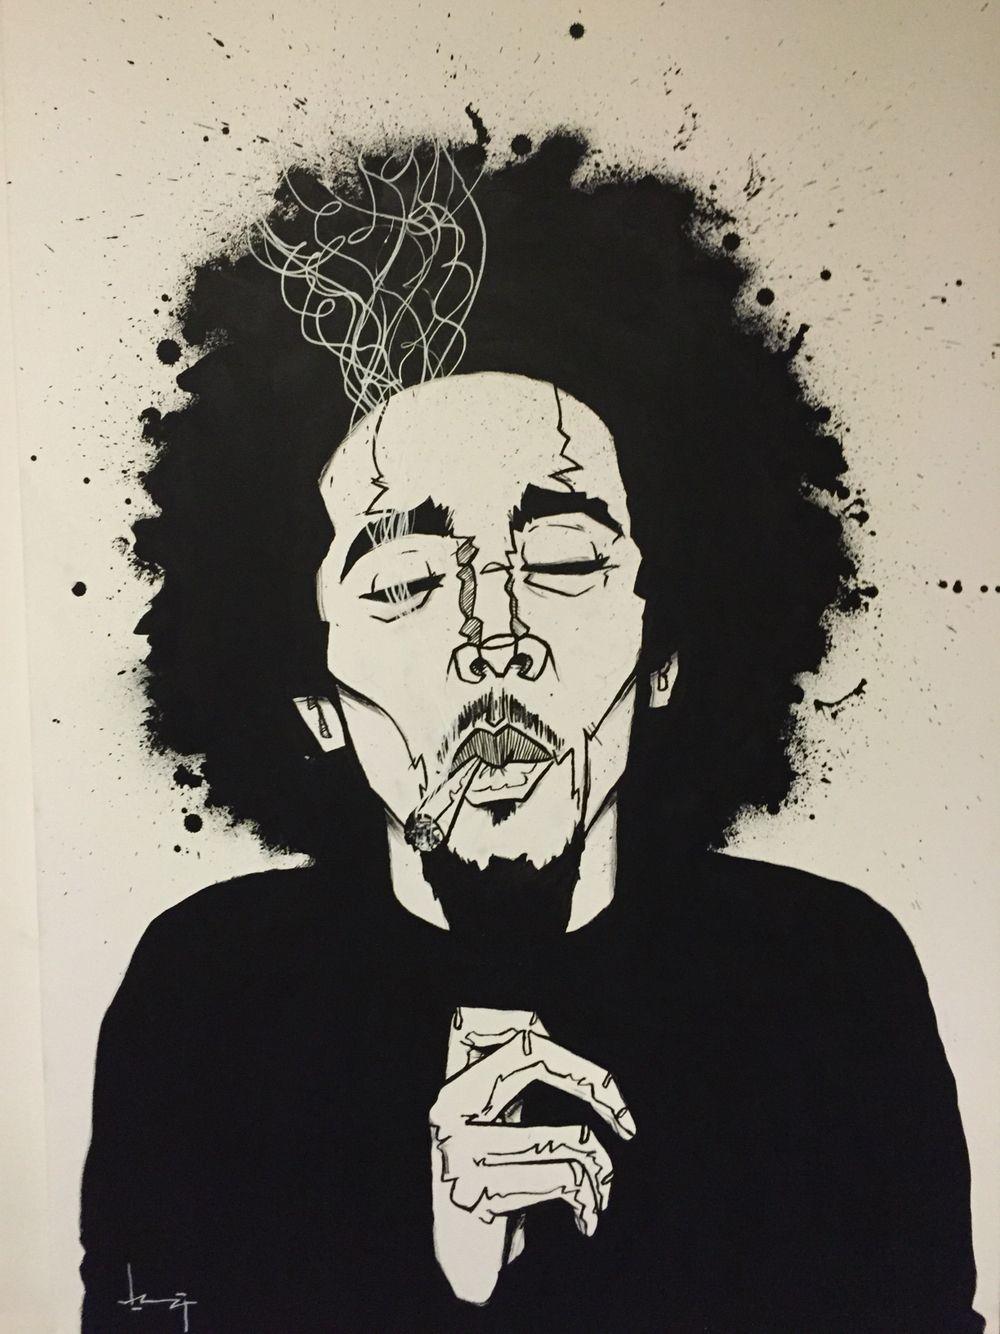 Bob Marley Painting By Kdkammijer Www Kdkammeijer Com Ilustraciones Drogas Arte Dibujos